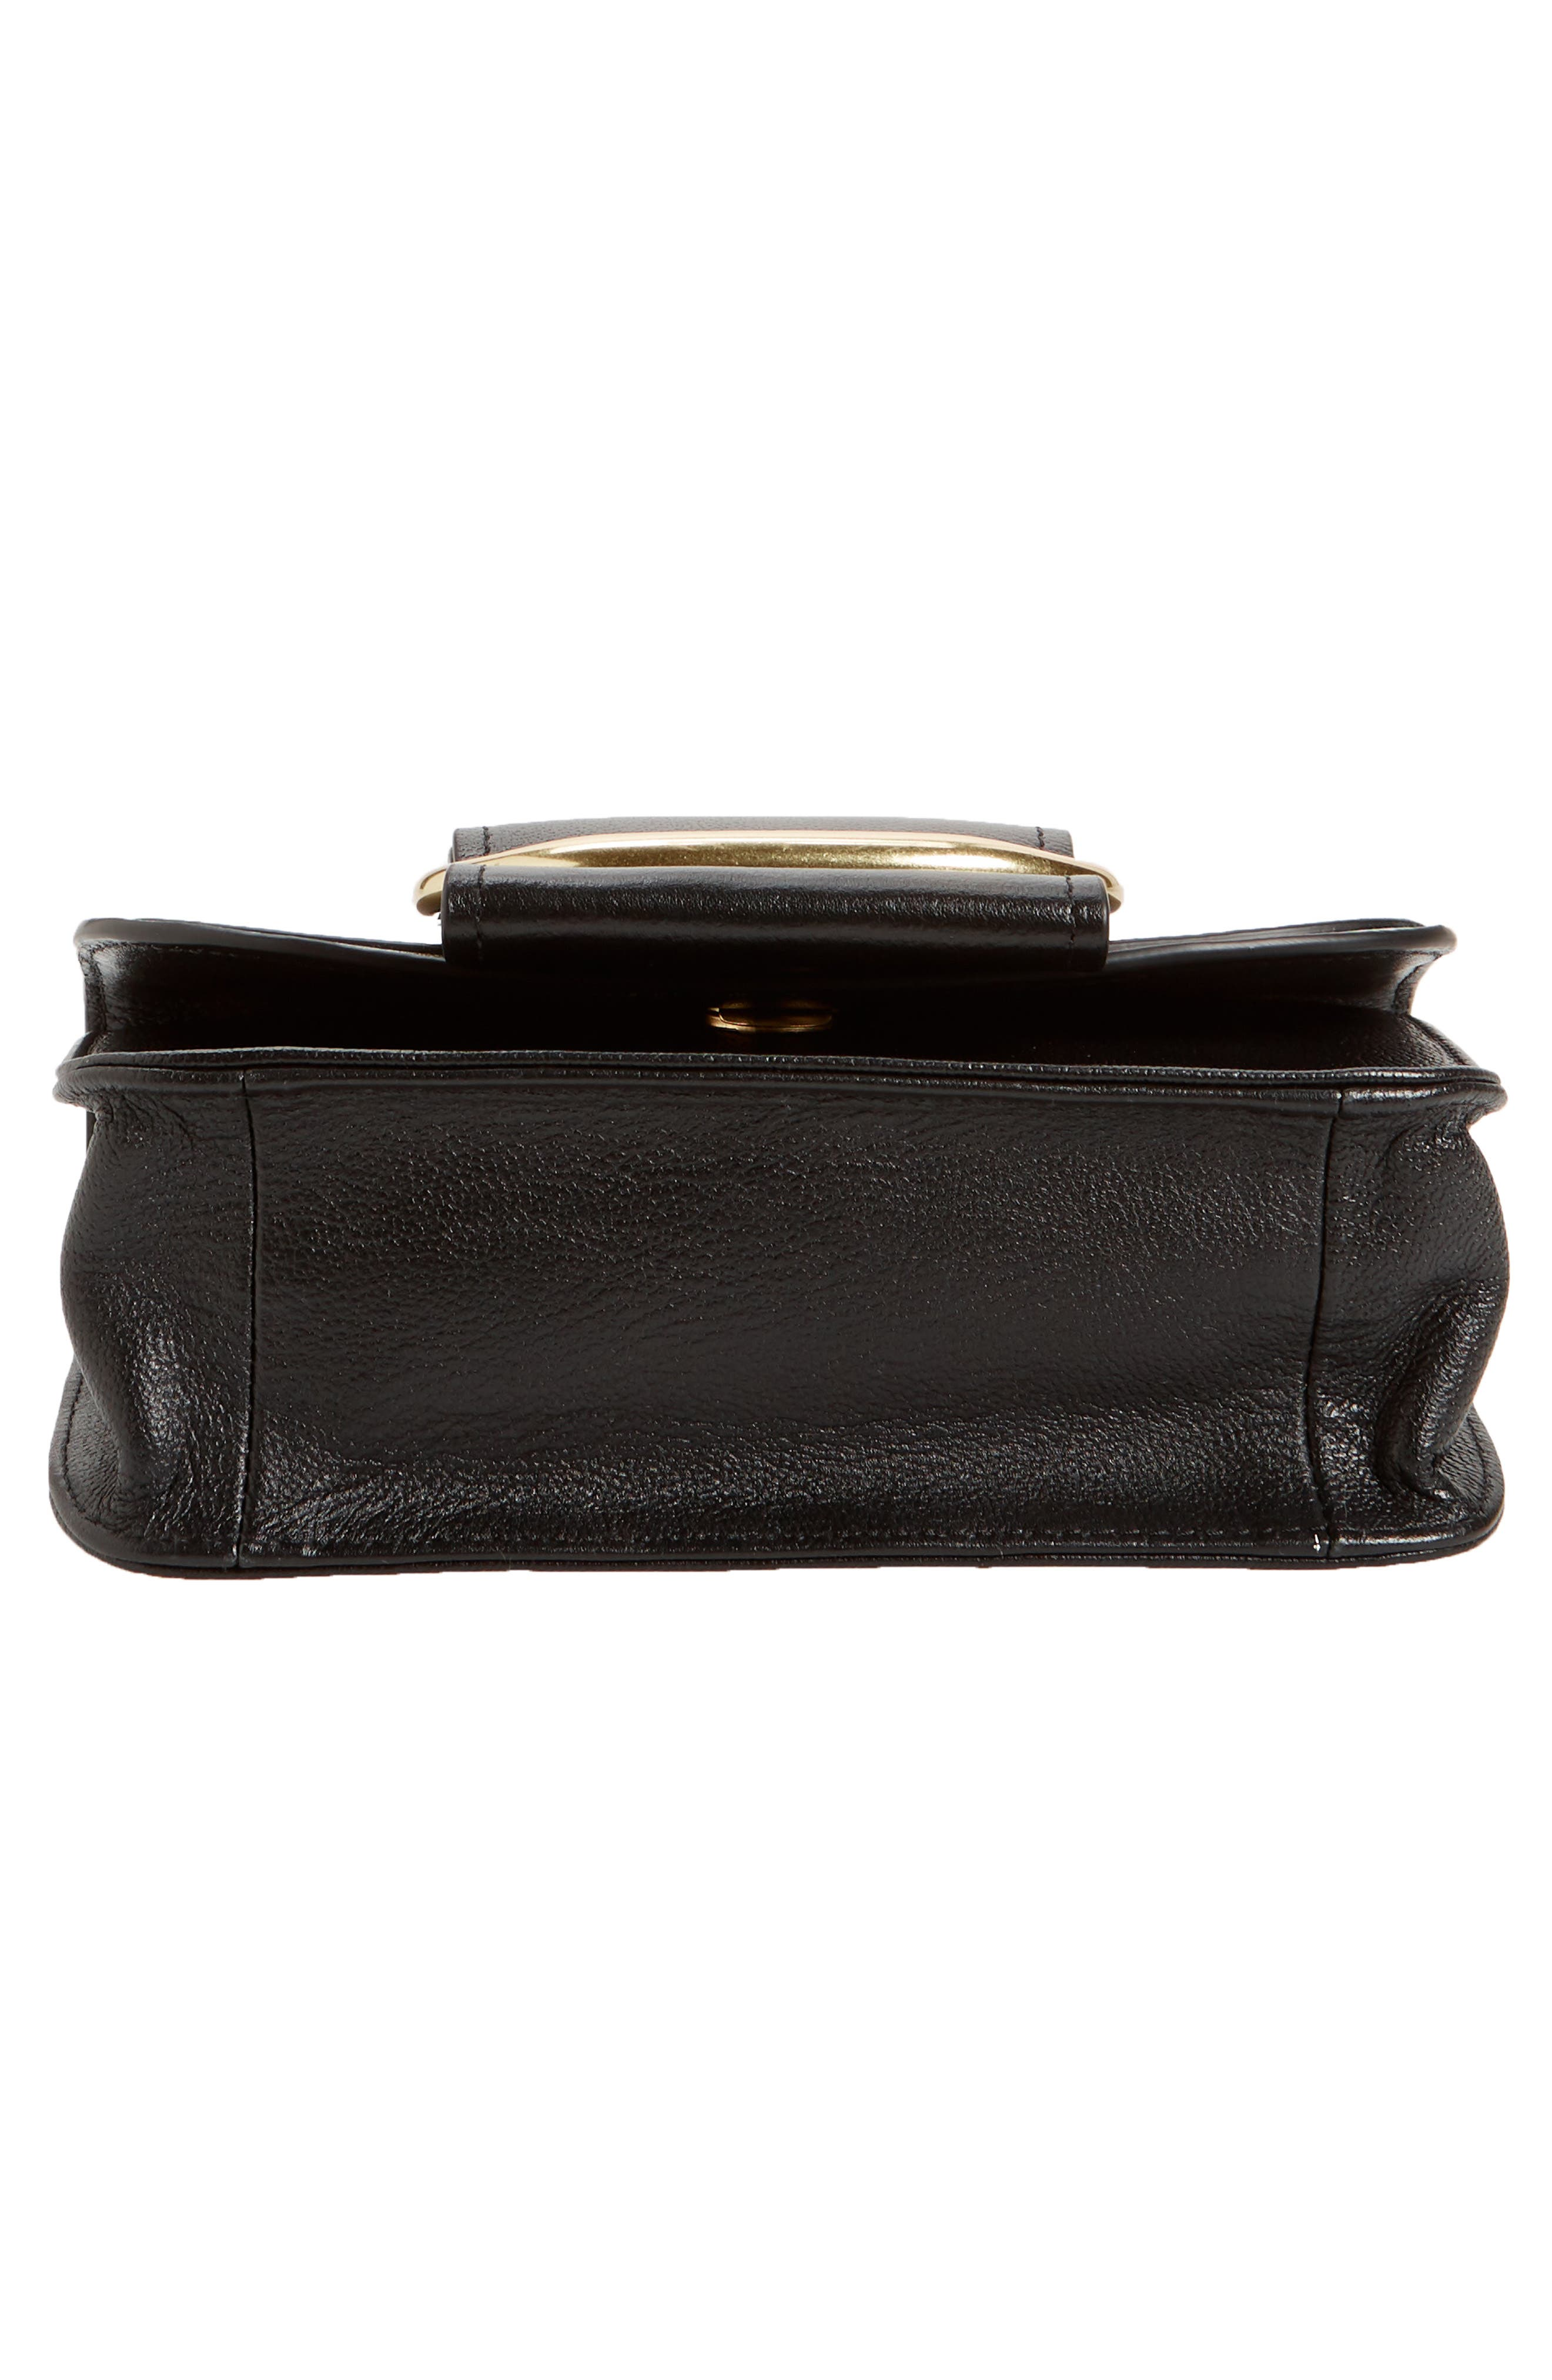 SEE BY CHLOÉ, Hopper Leather Shoulder Bag, Alternate thumbnail 7, color, 001